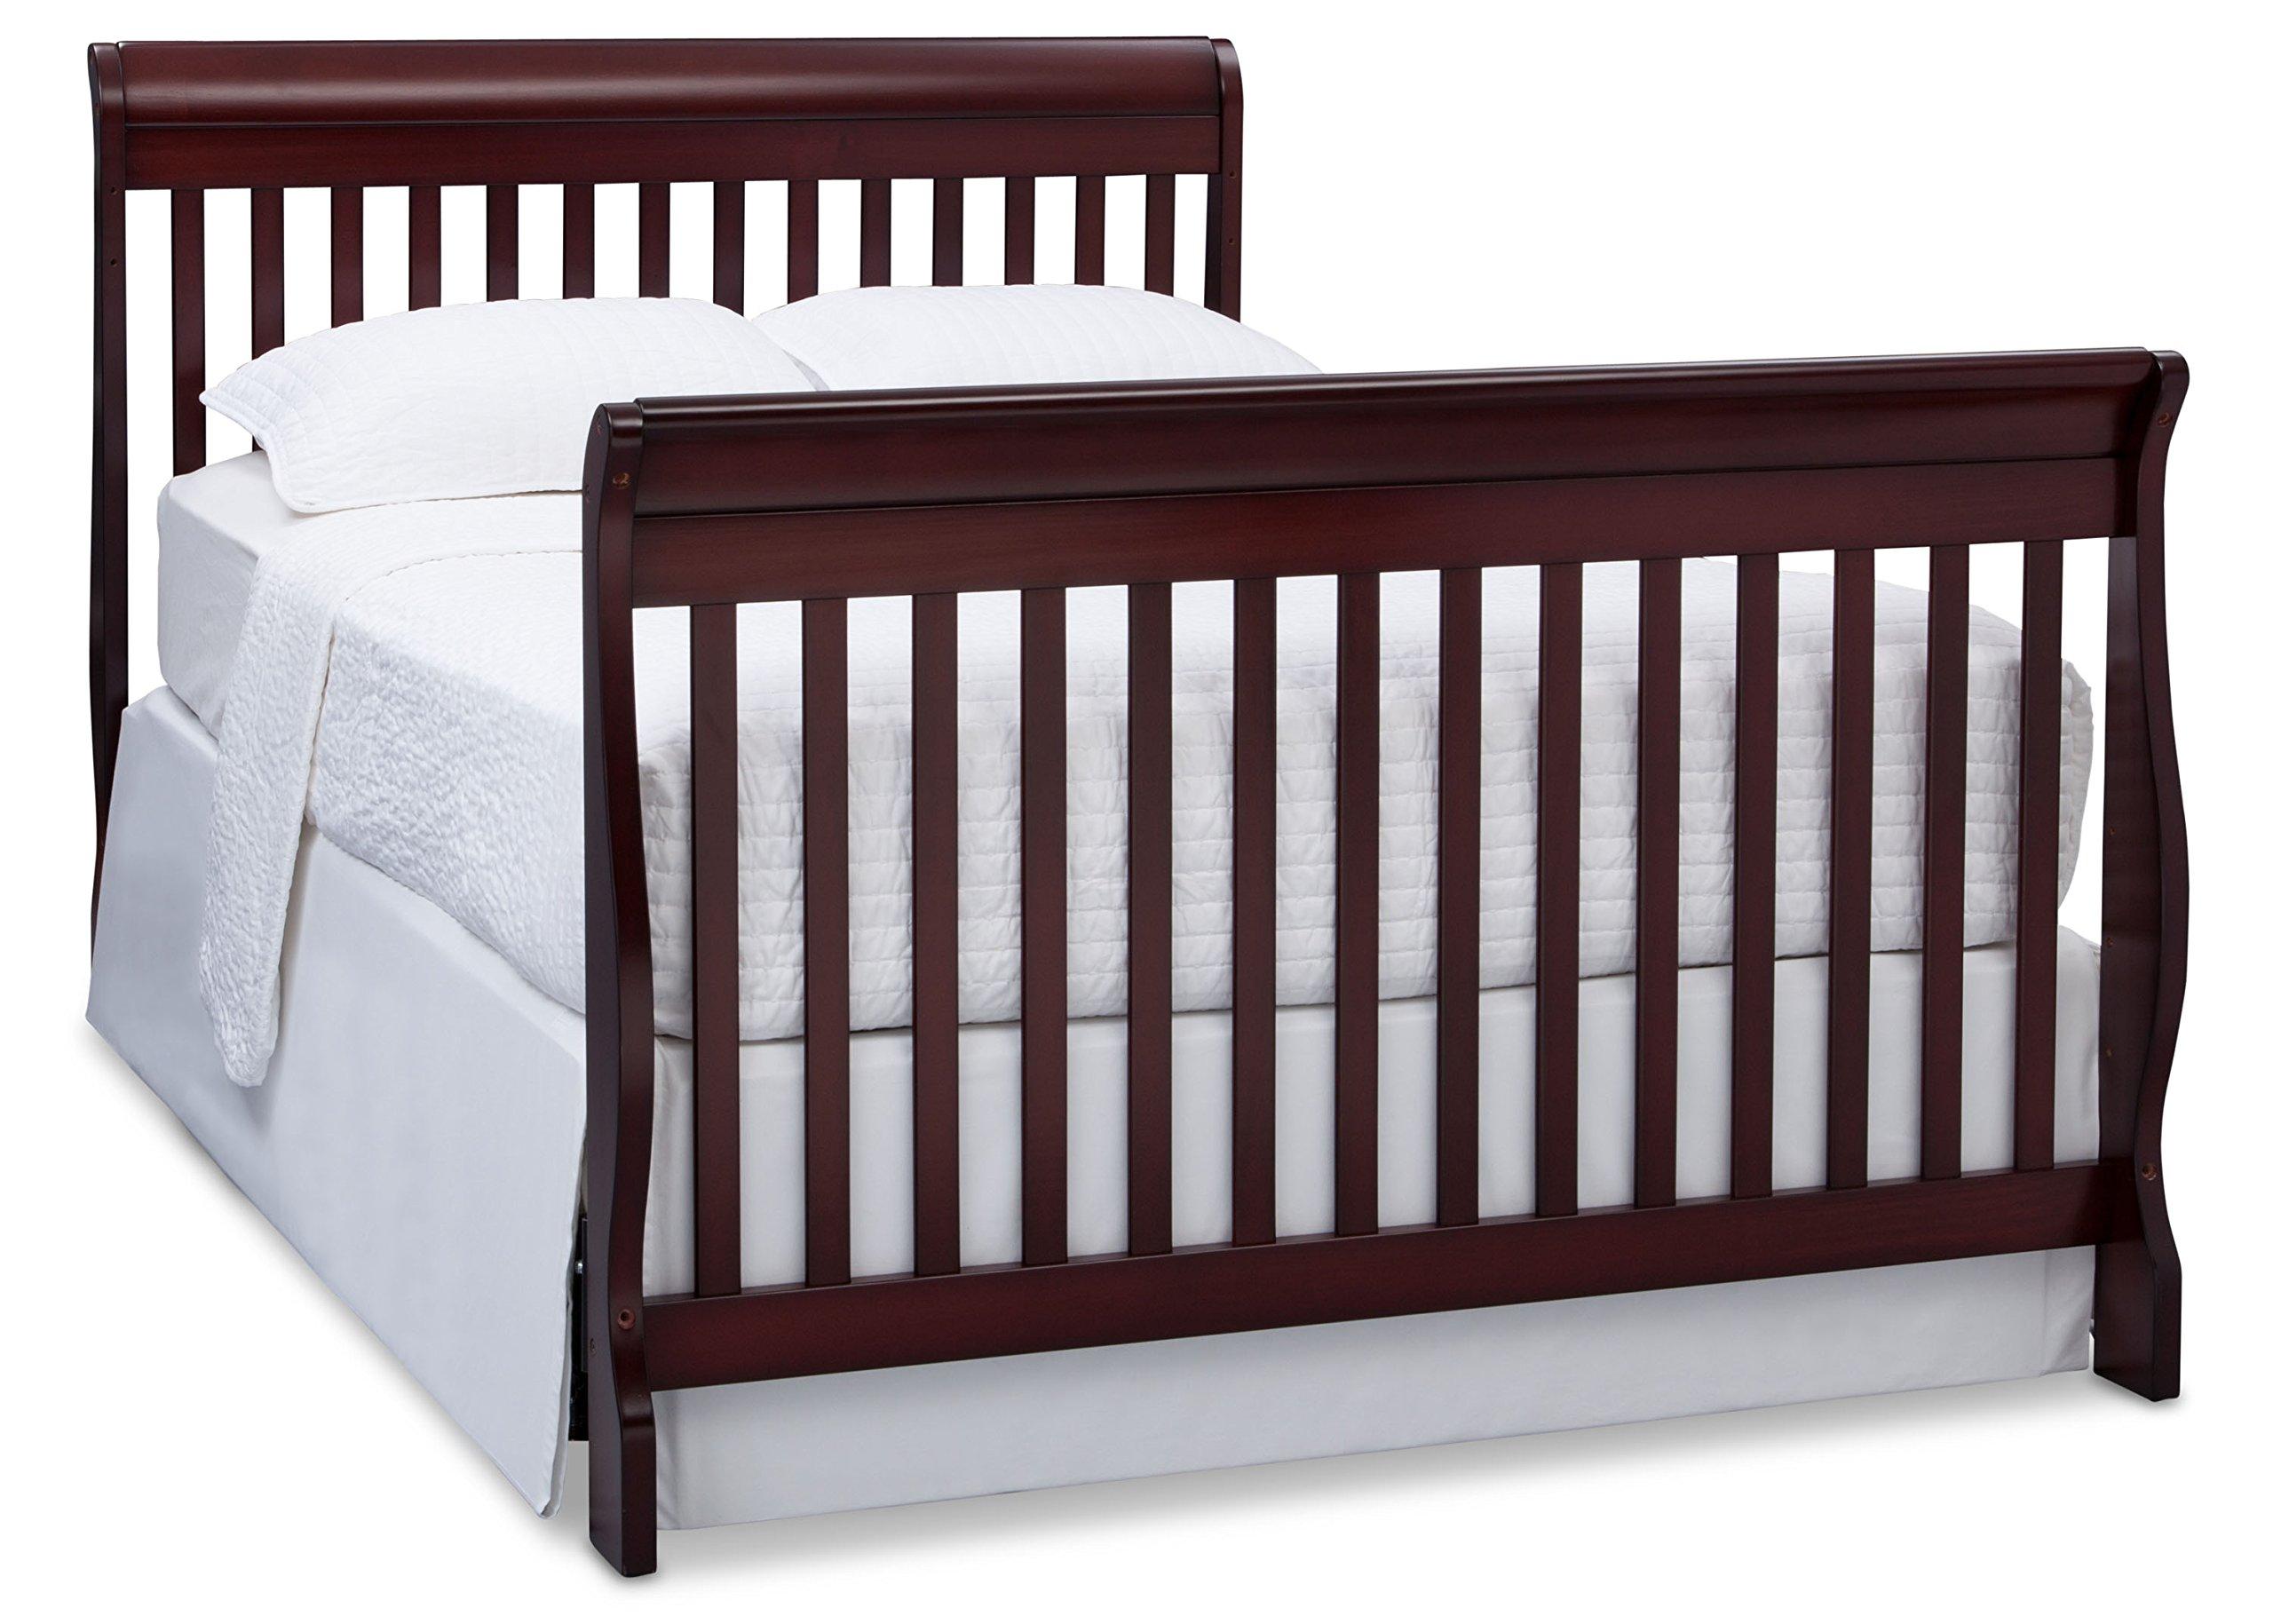 Galleon - Delta Children Canton 4-in-1 Convertible Baby ...